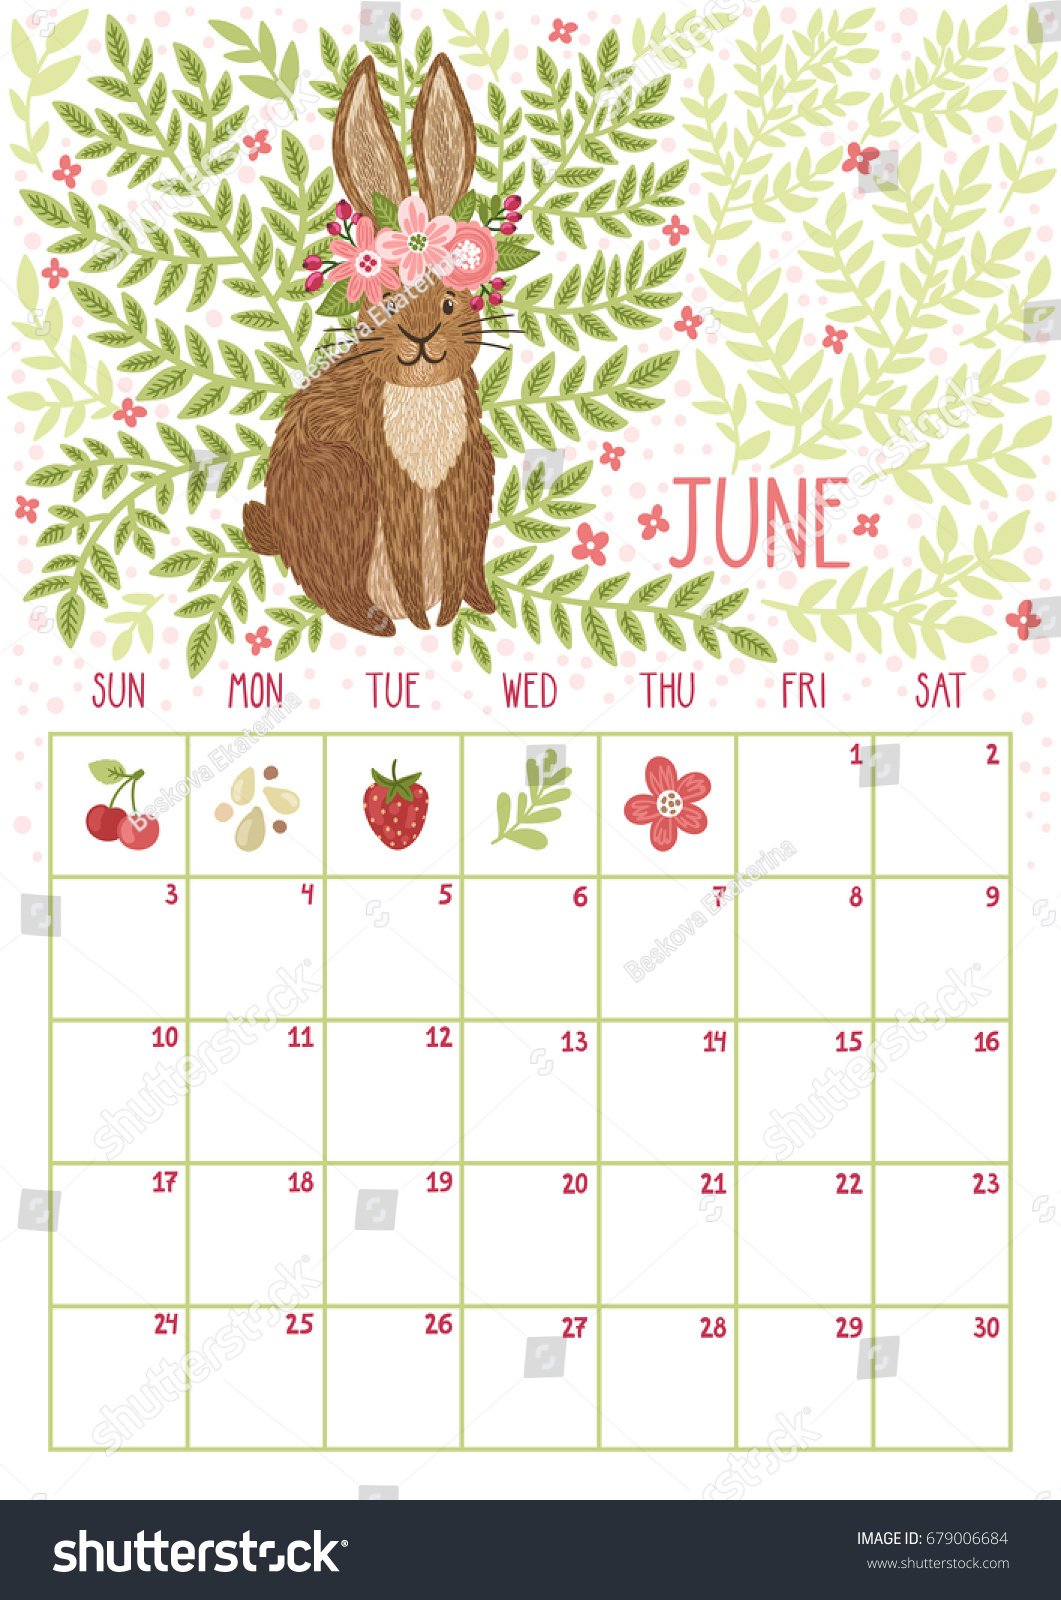 Calendar Pages Vector : Vector monthly calendar cute rabbit june stock